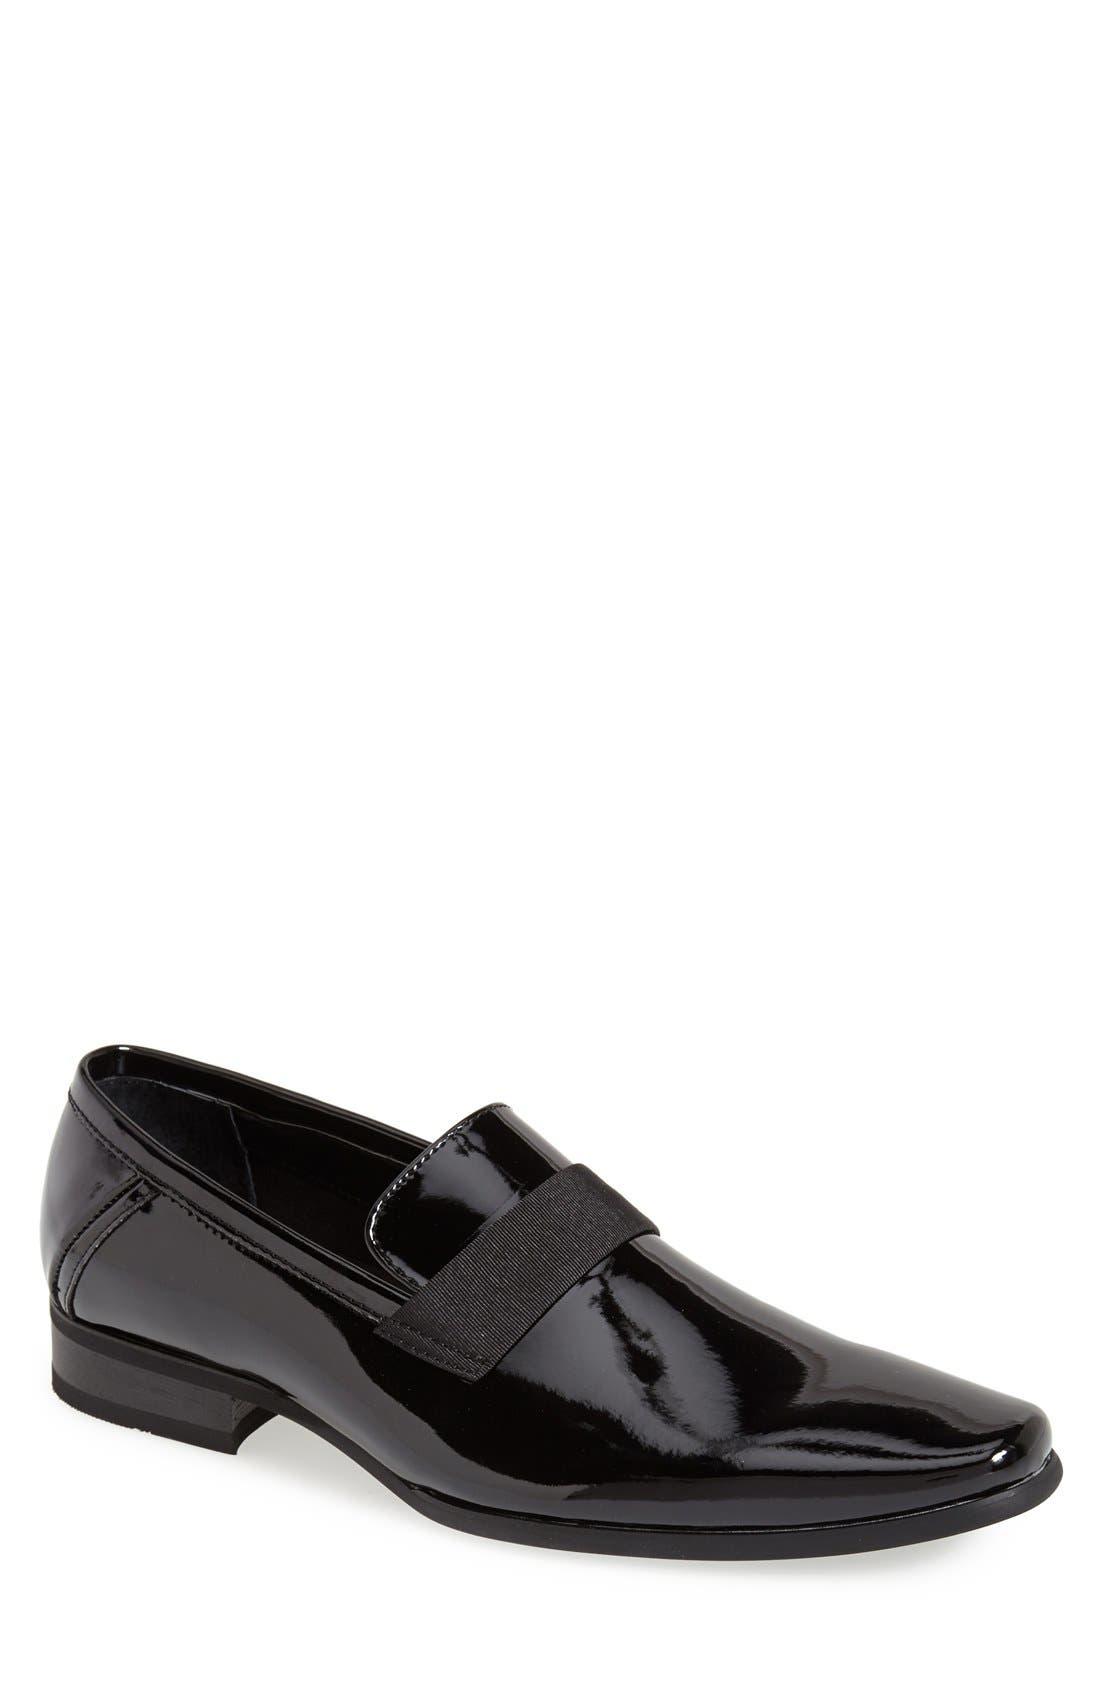 'Bernard' Venetian Loafer, Main, color, BLACK